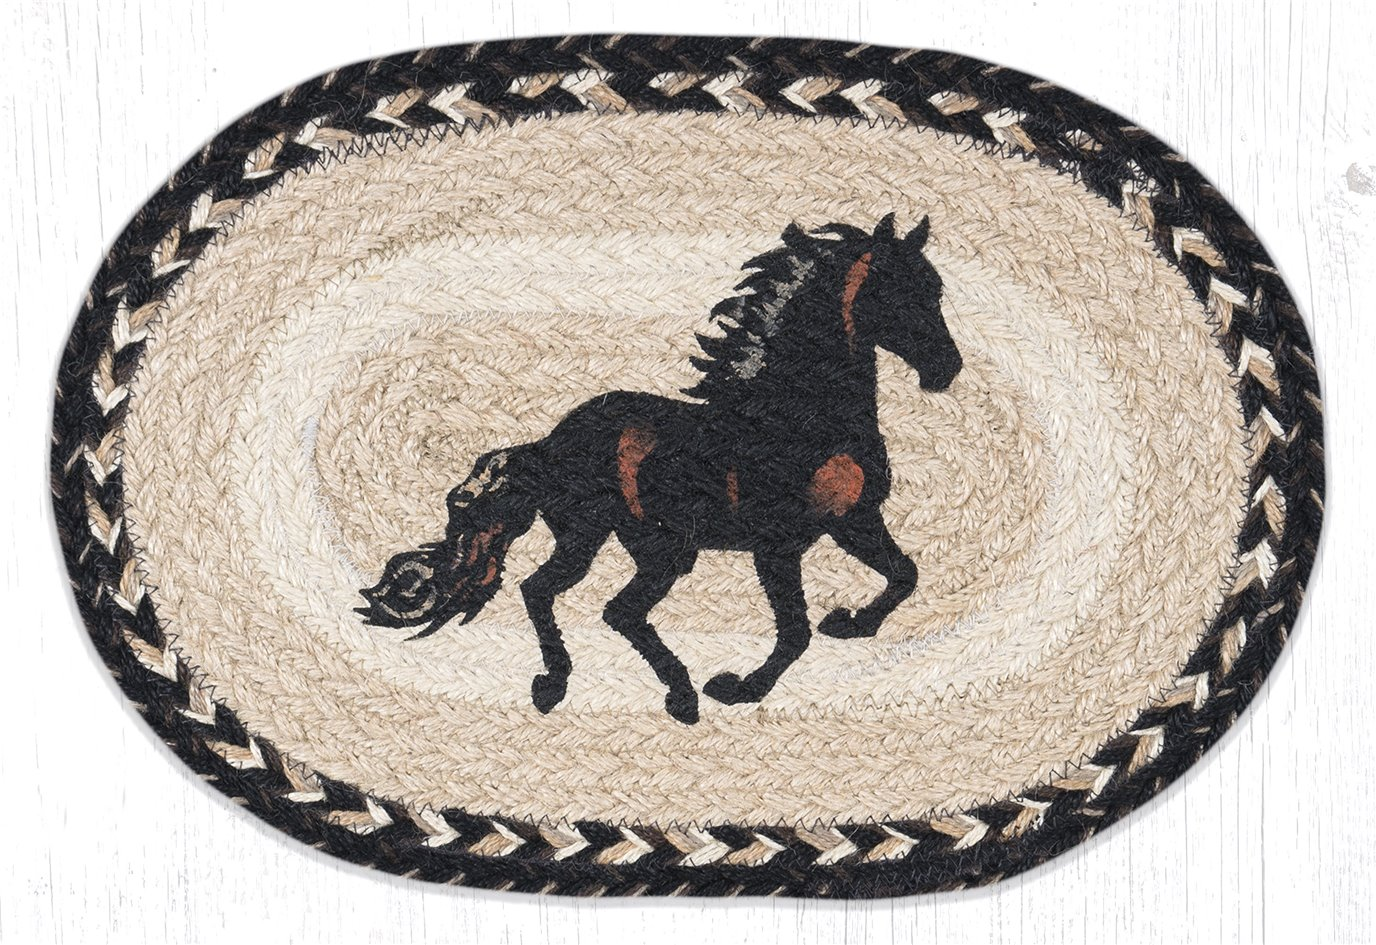 "Stallion Printed Oval Braided Swatch 10""x15"""